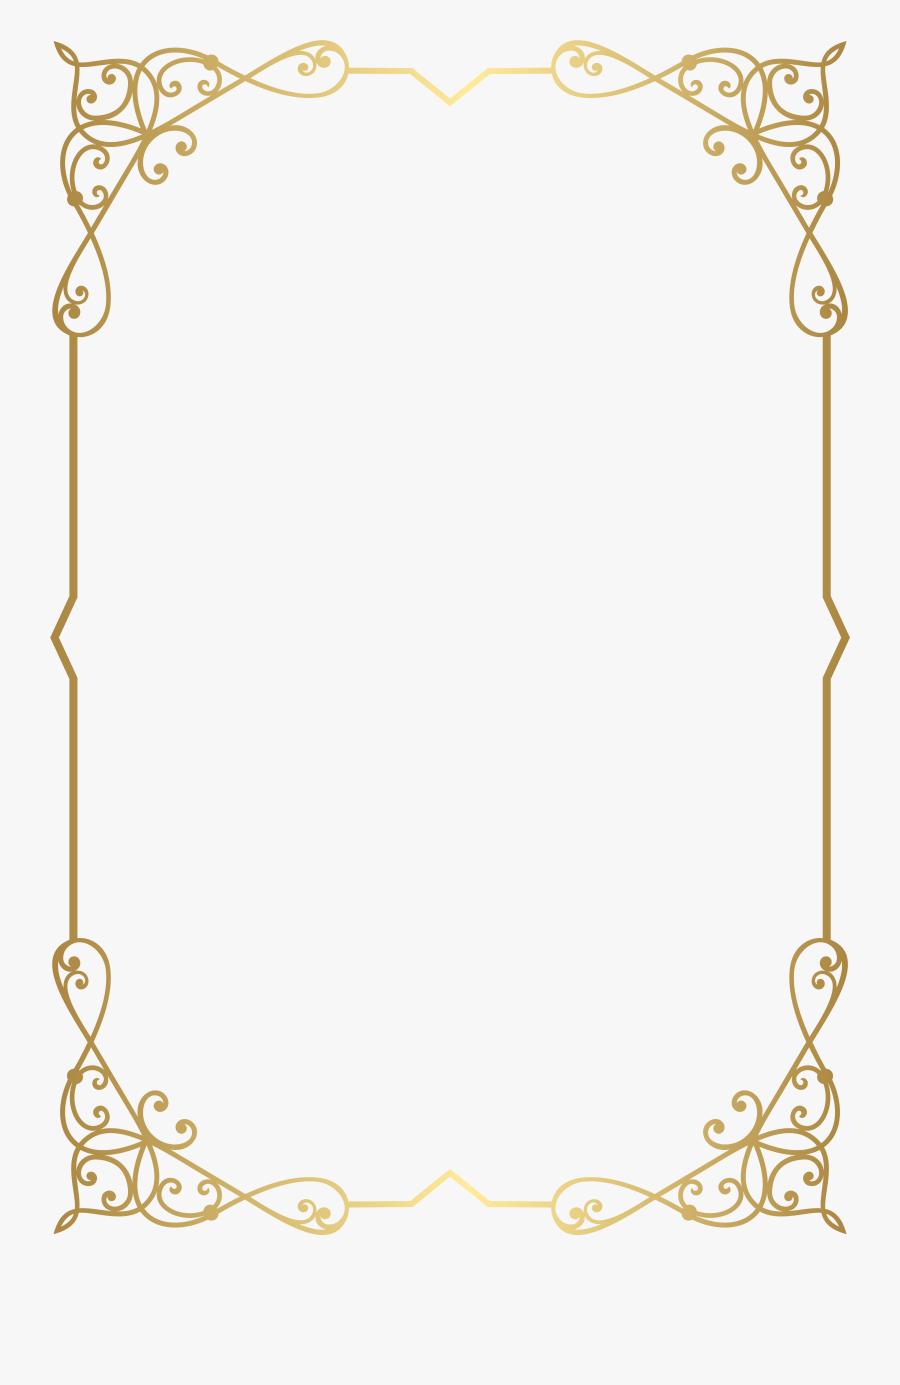 Cliparts Border High Resolution - Transparent Background Border Png, Transparent Clipart